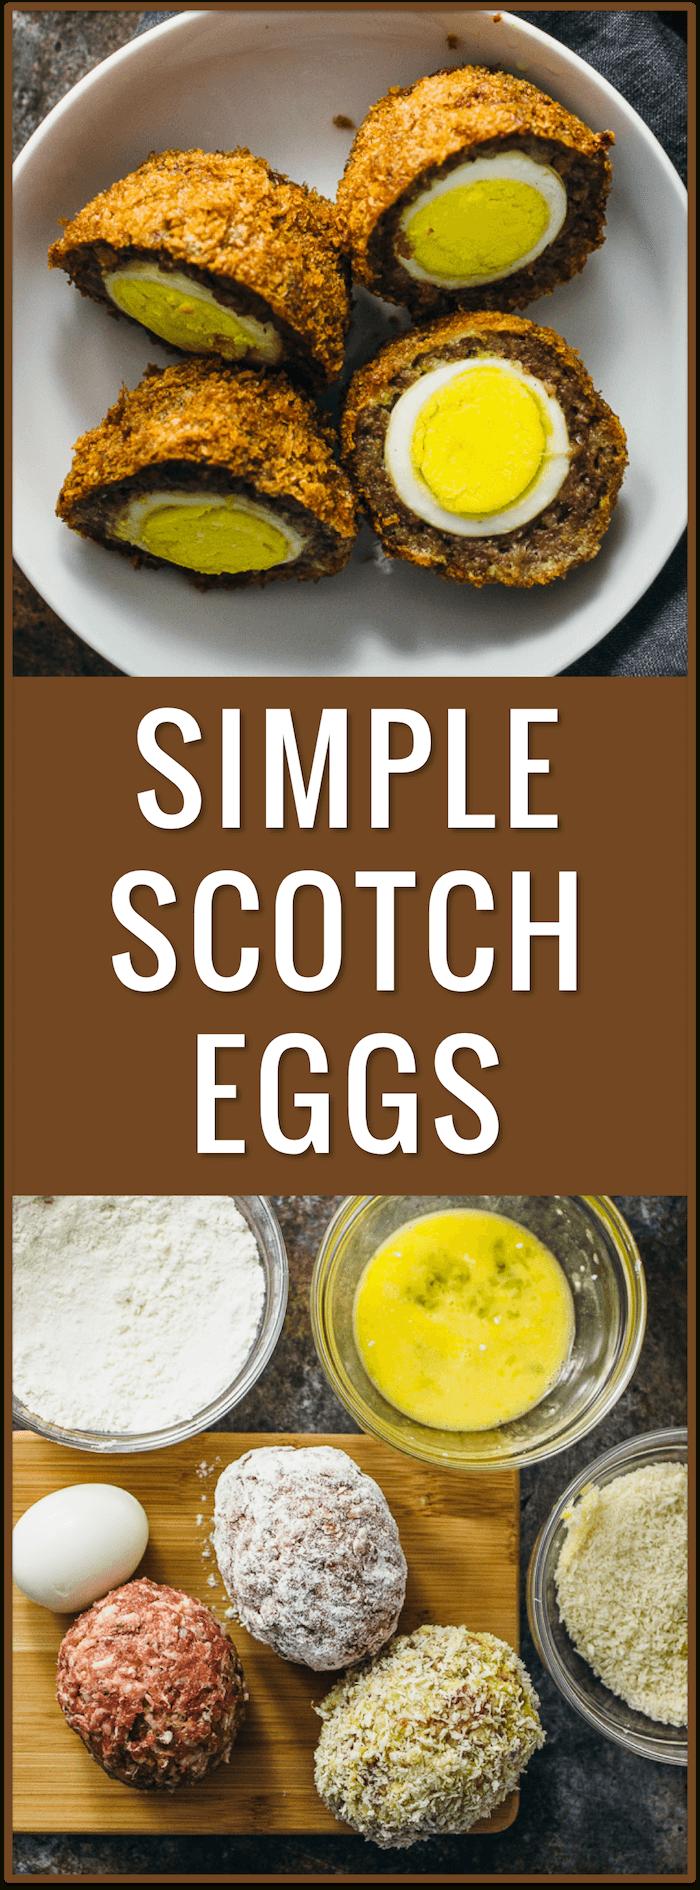 simple easy scotch eggs, baked, fried, sauce, scottish, irish, british, ground meat, pork sausage, dinner recipe, protein, portable snack